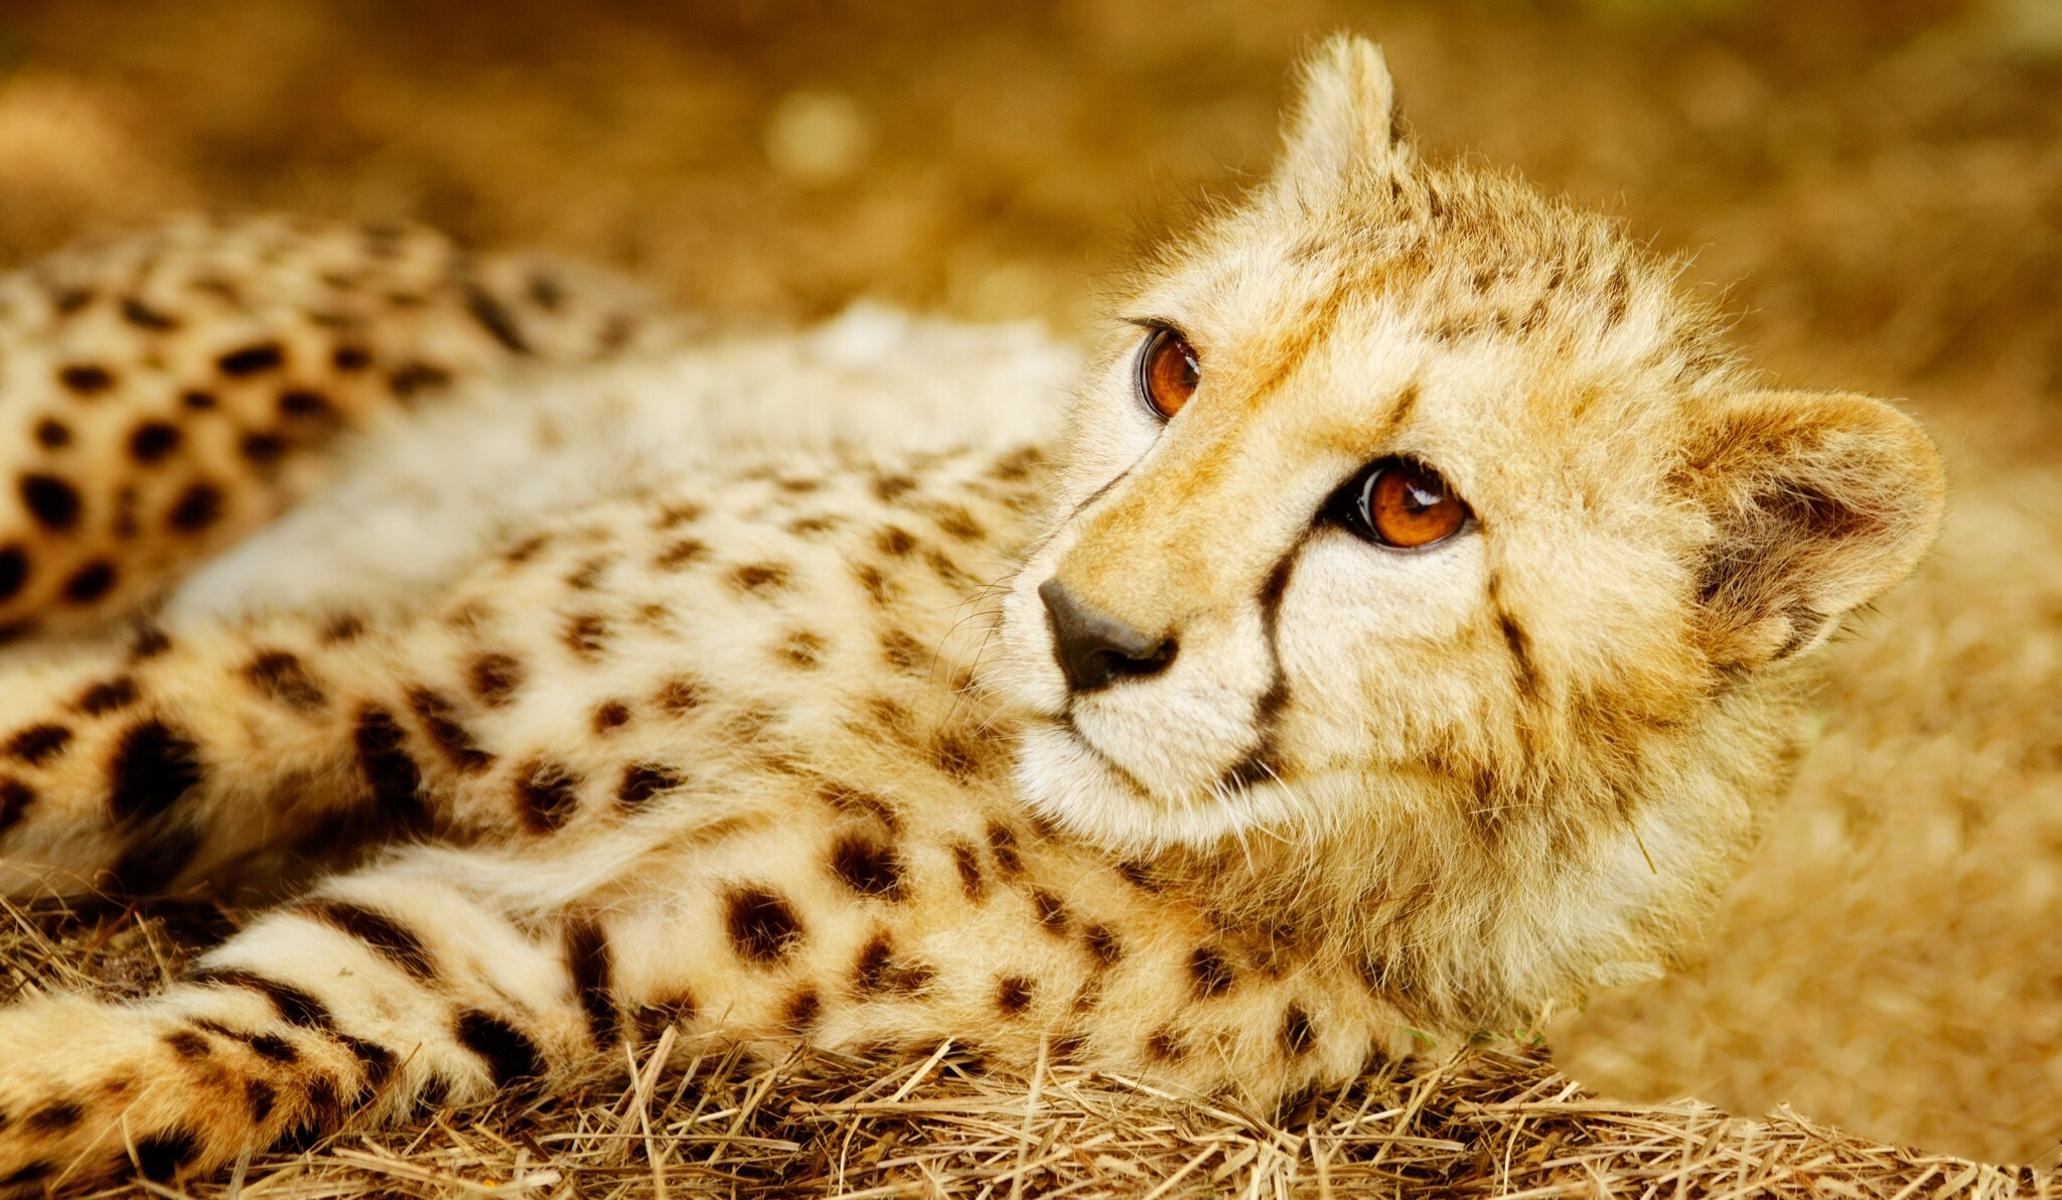 Cute Cheetah Wallpapers Cheetah Full Hd Wallpaper And Background Image 2062x1200